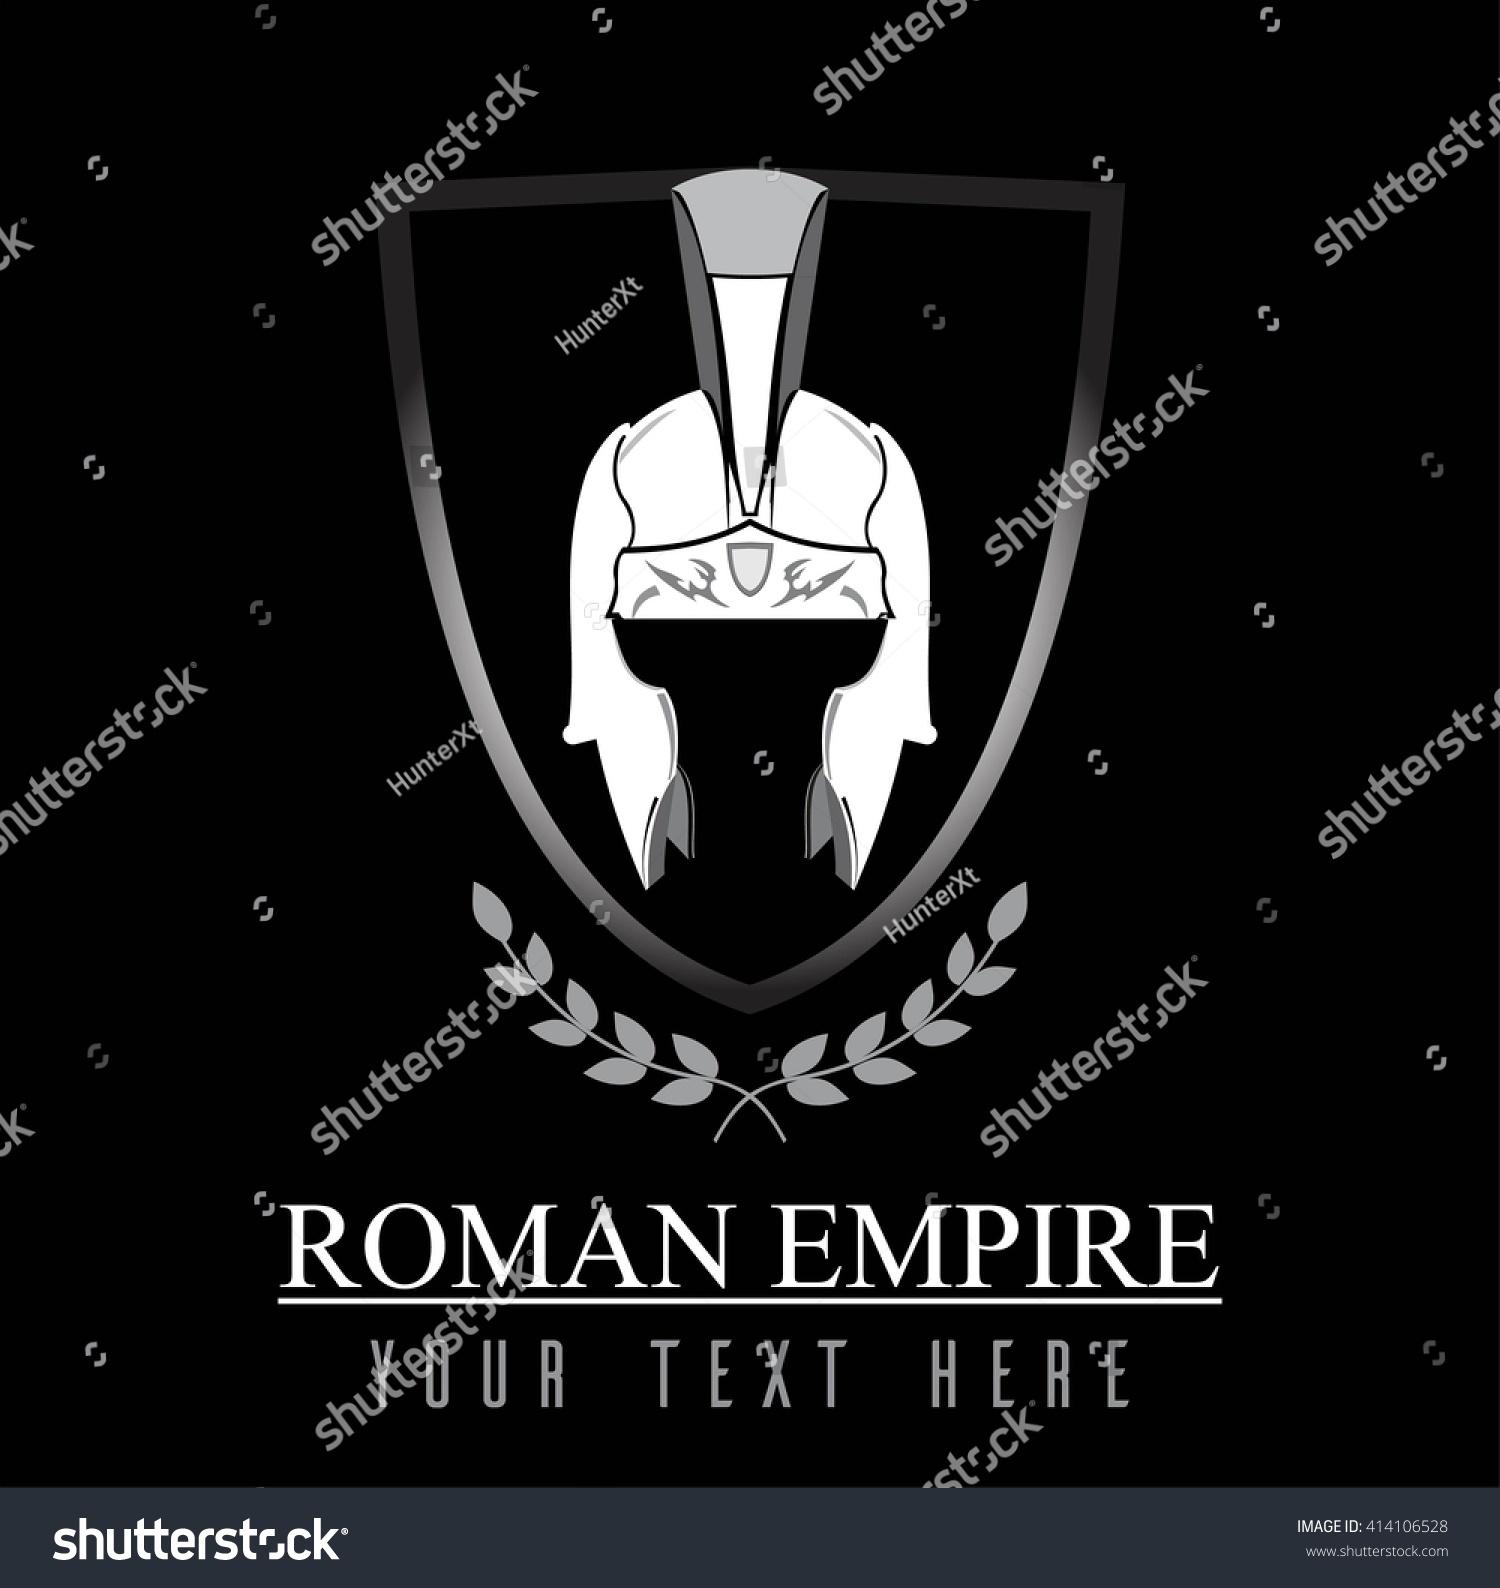 centurion symbol